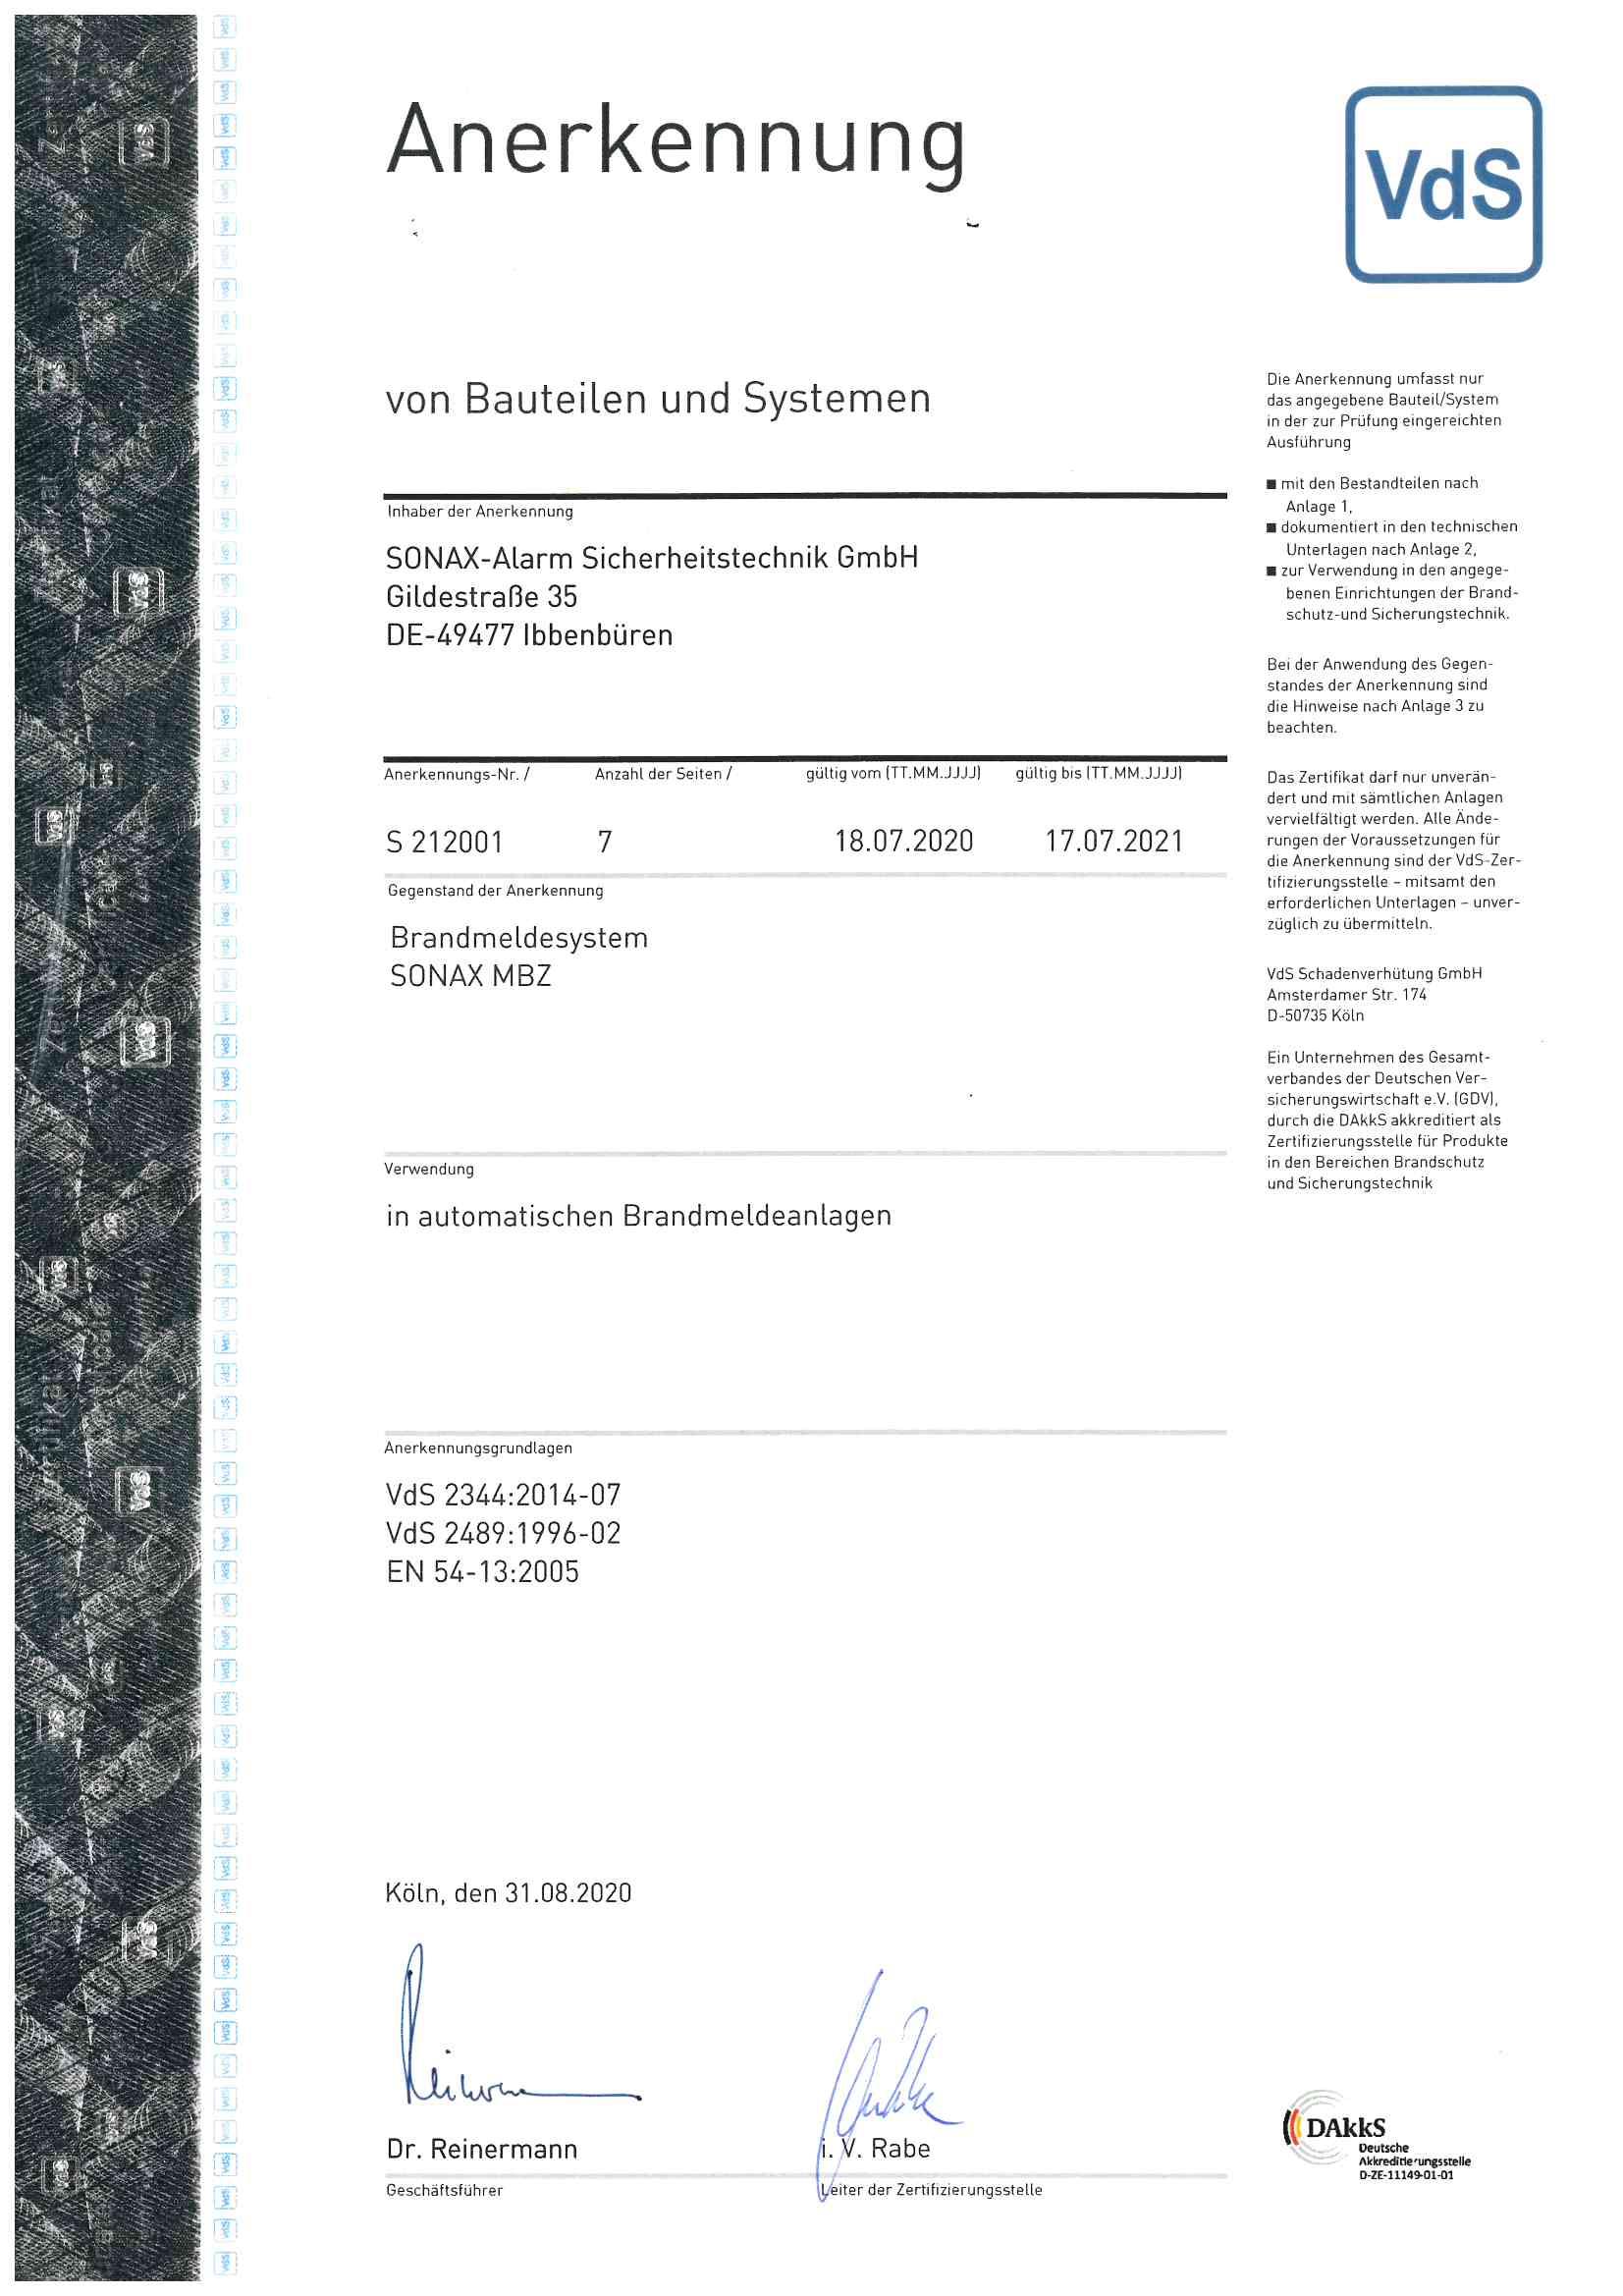 Zertifikat_Brandmeldesystem SONAX MBZ S212001